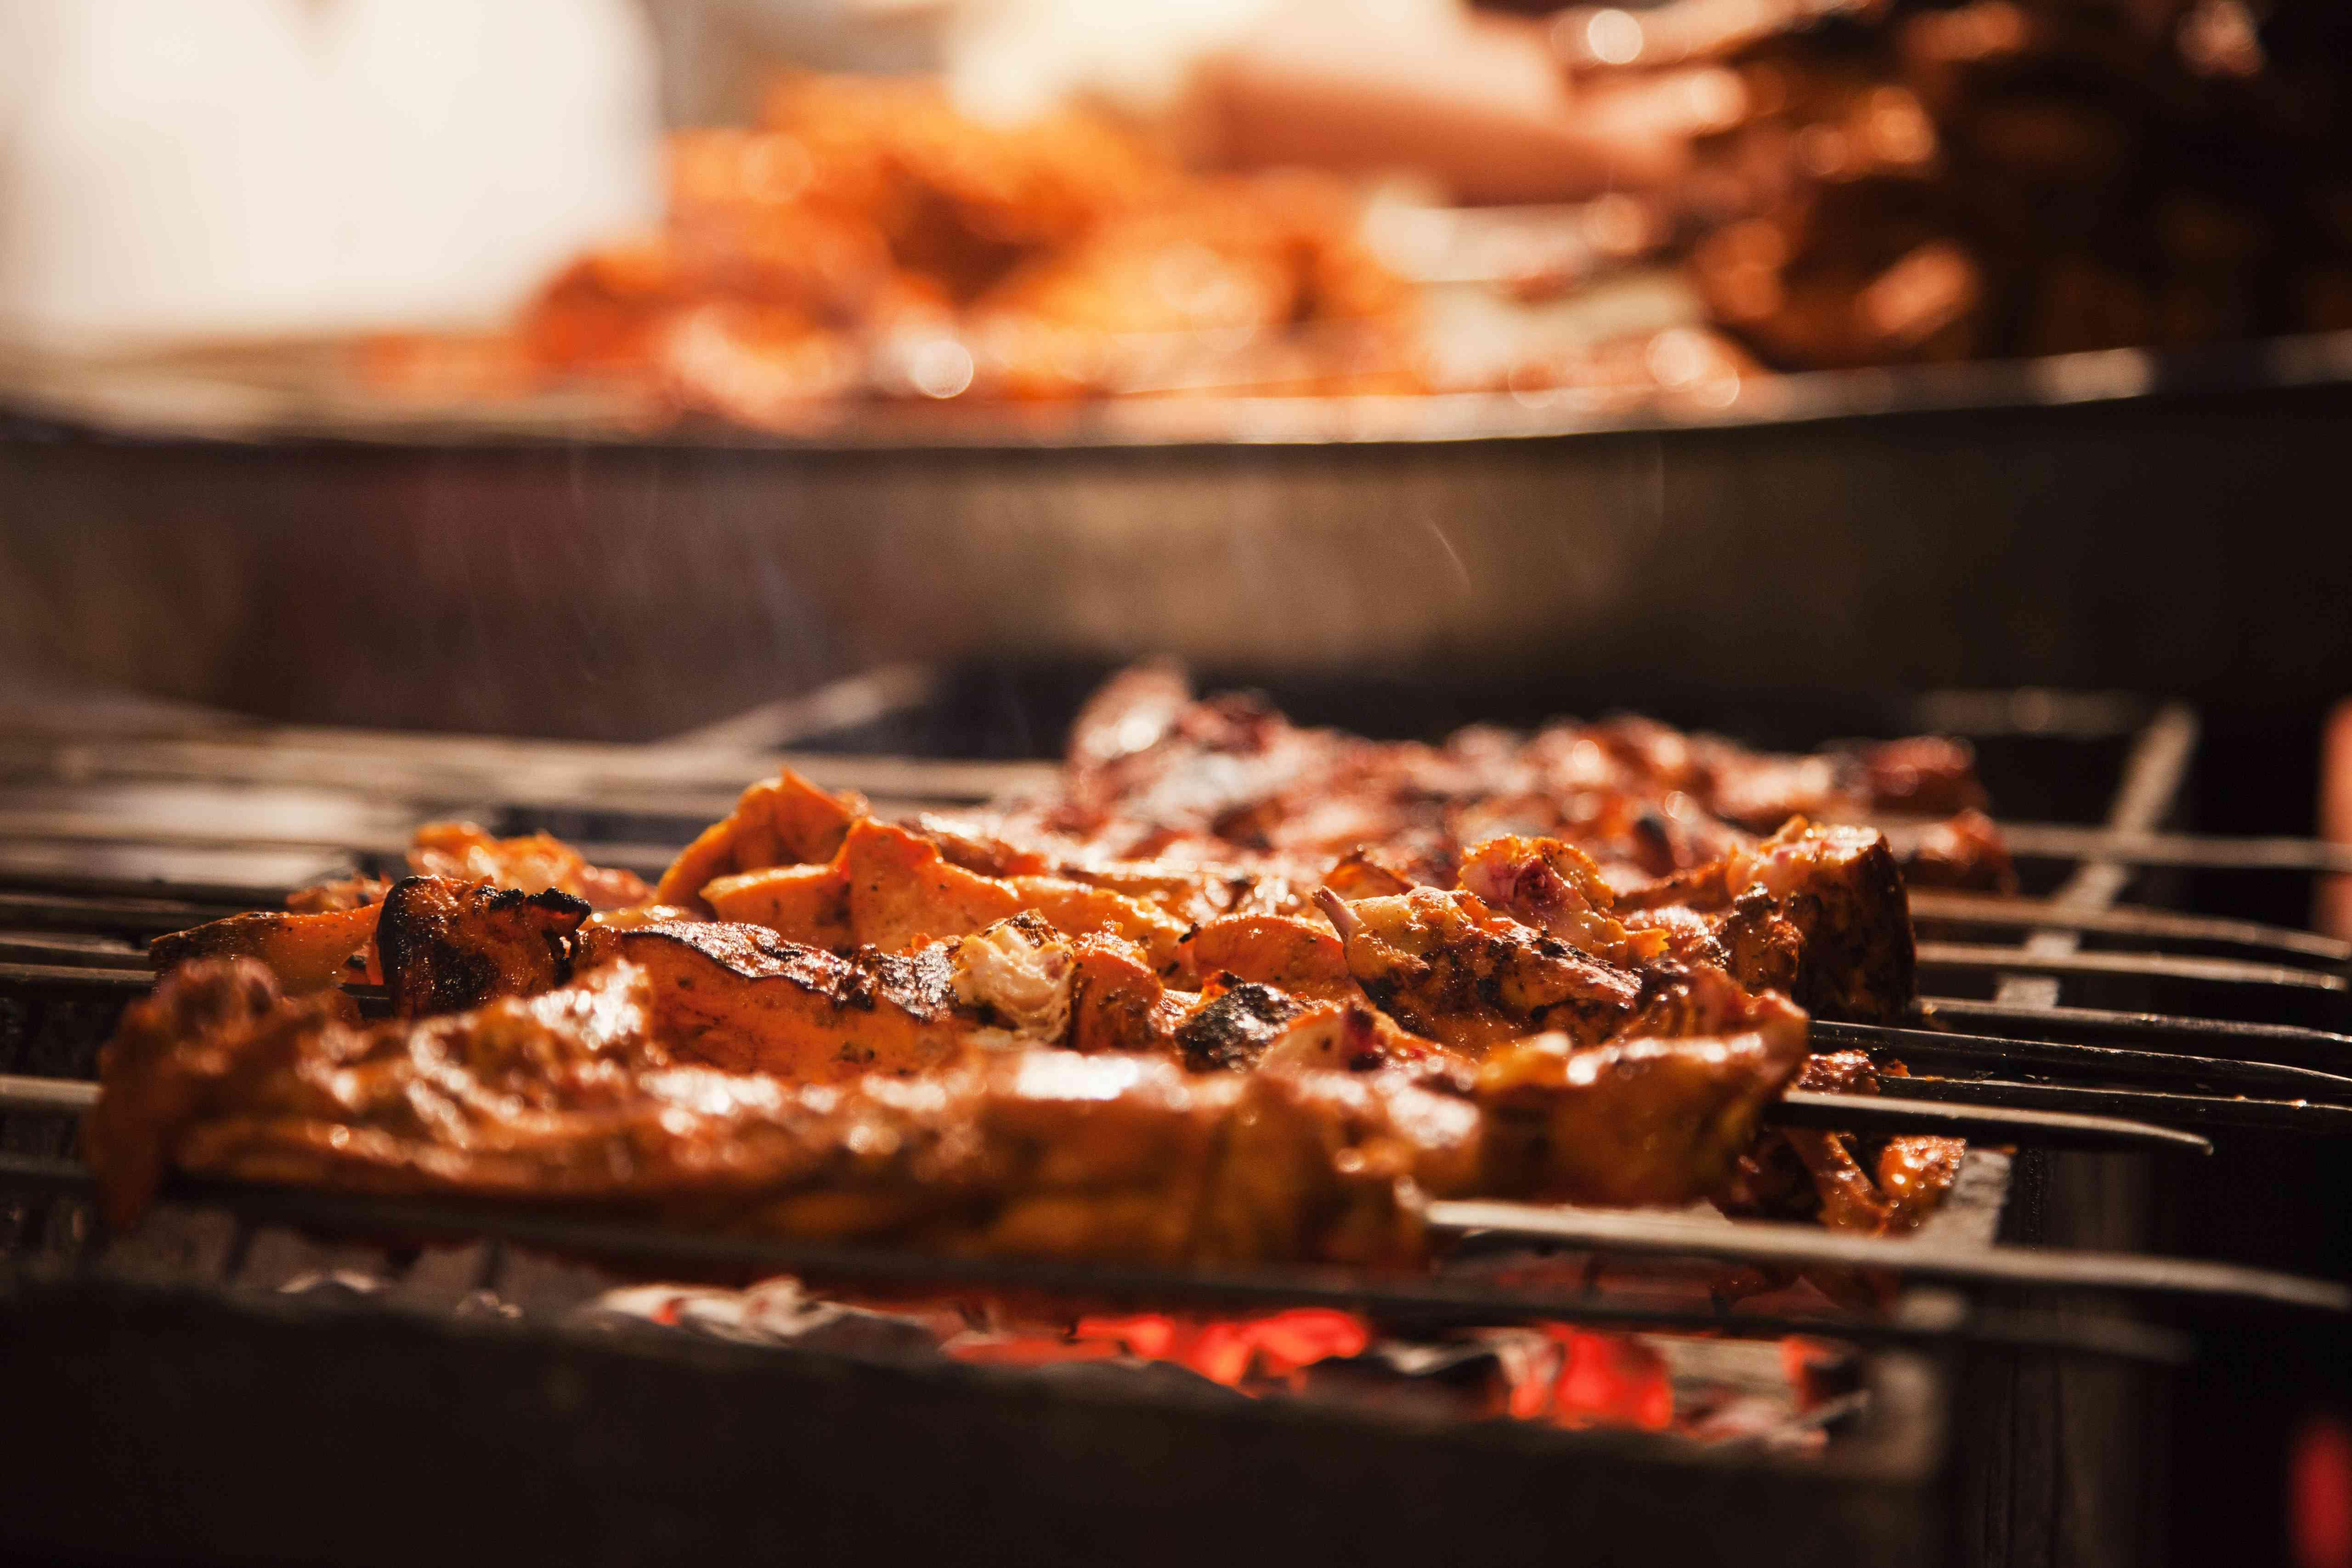 Close-up of kebabs, Chandni Chowk, Old Delhi, Delhi, India